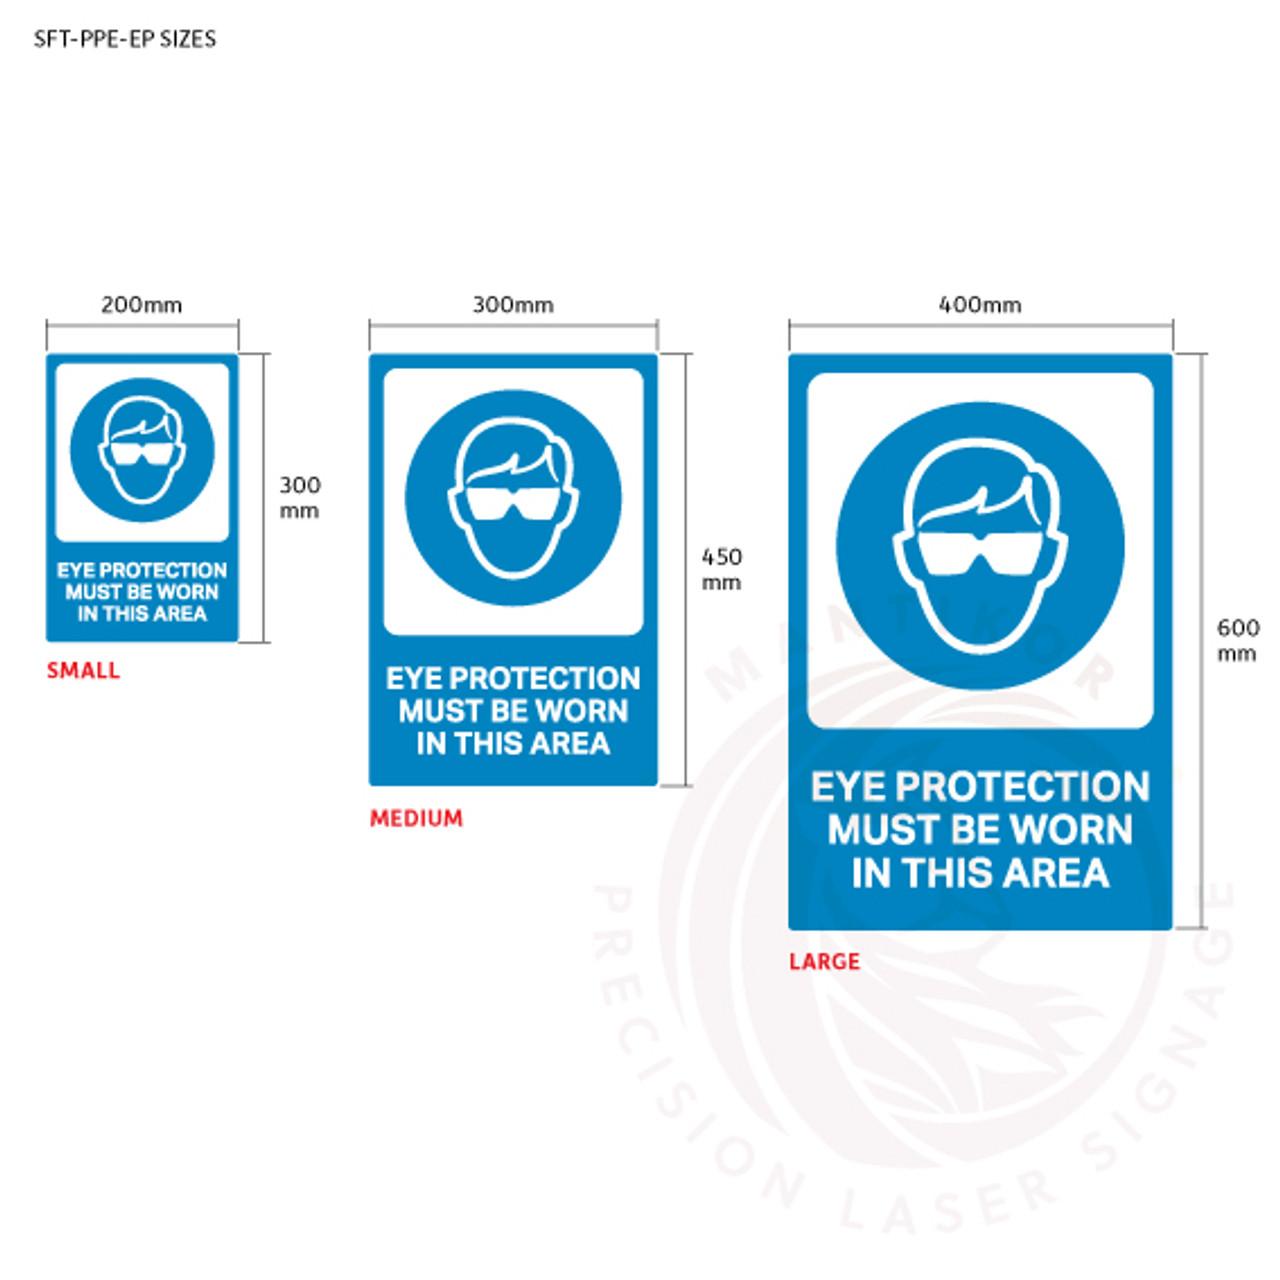 PPE Safety Signage - Eye protection sign sizes